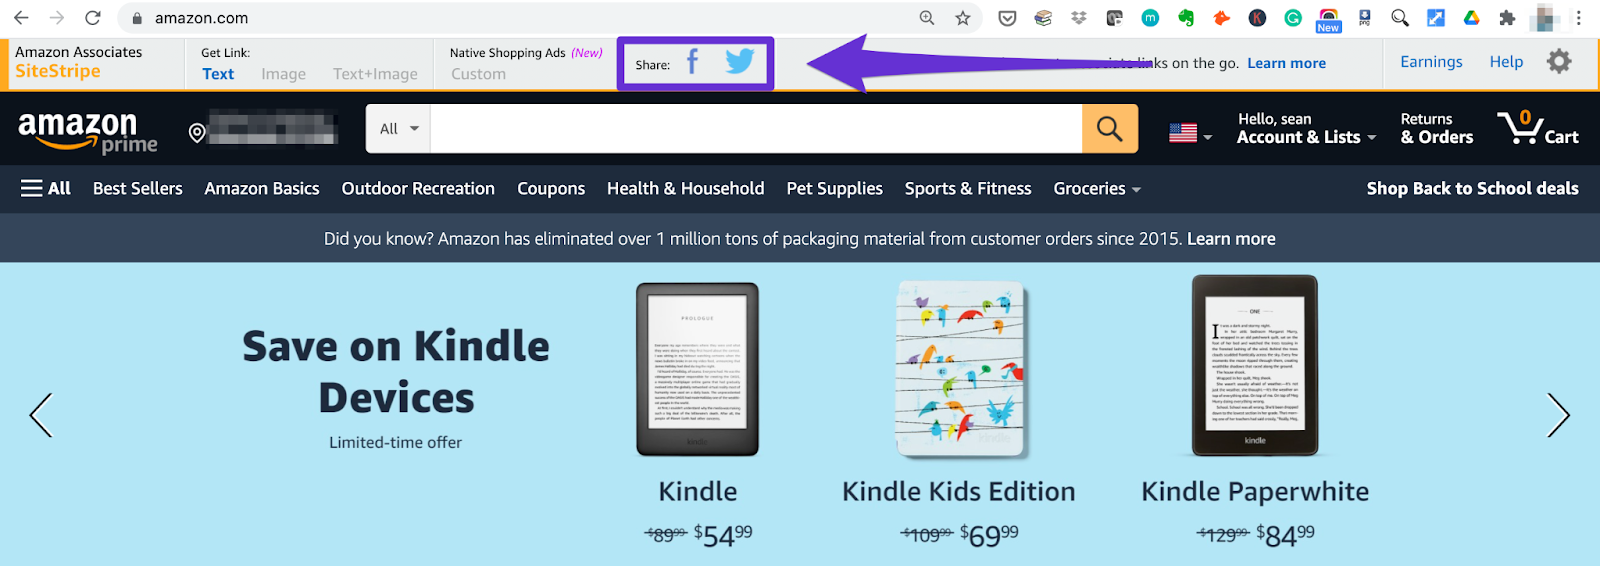 amazon affiliate program site strip social share buttons